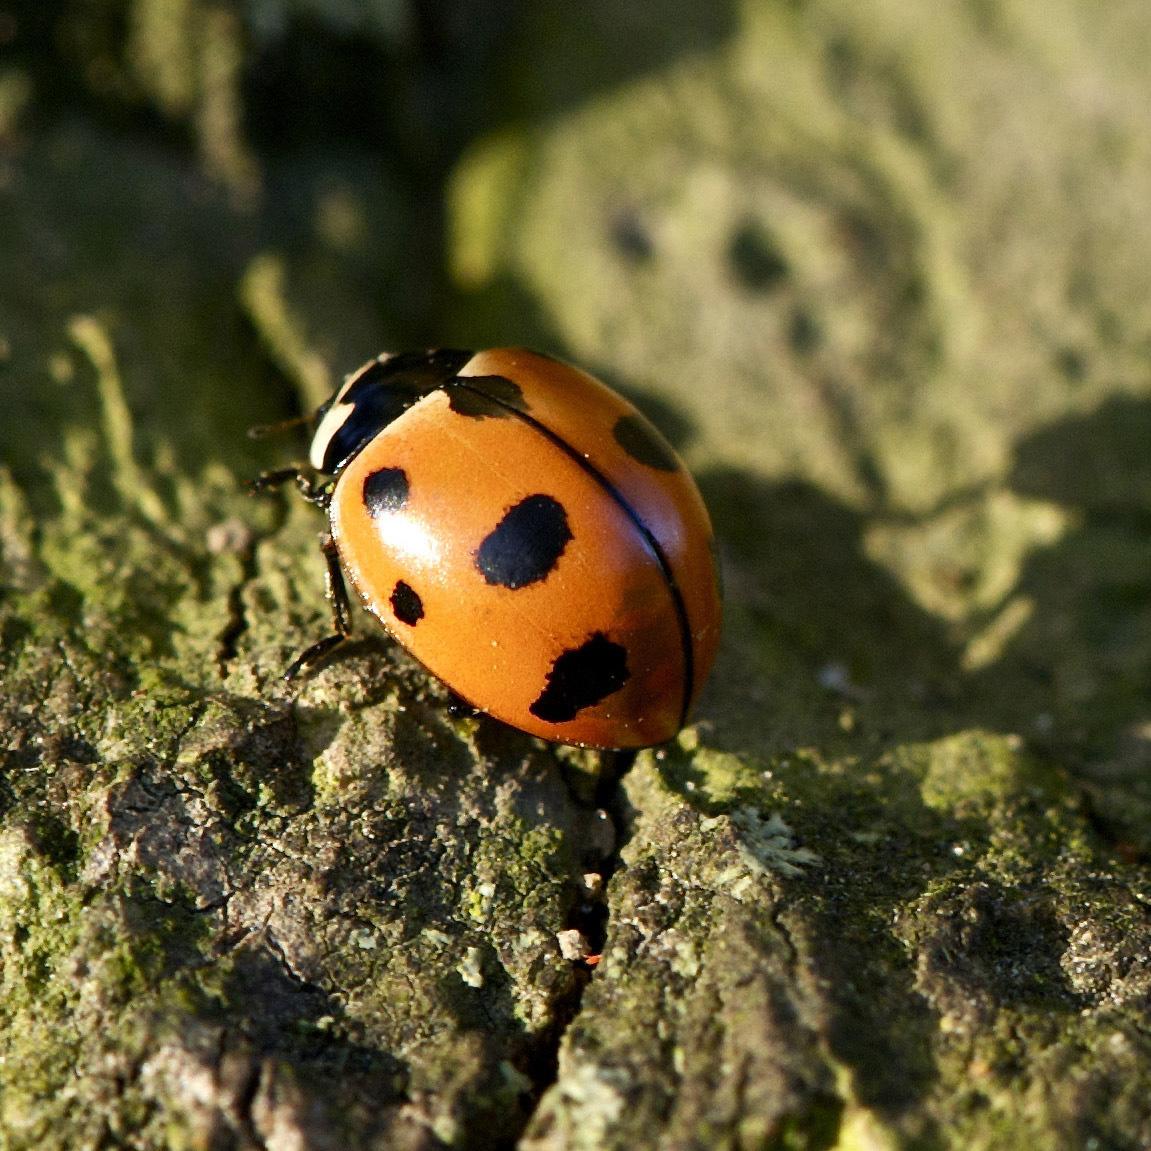 A bright orange-red lady beetle (ladybug) sits on a mossy log.